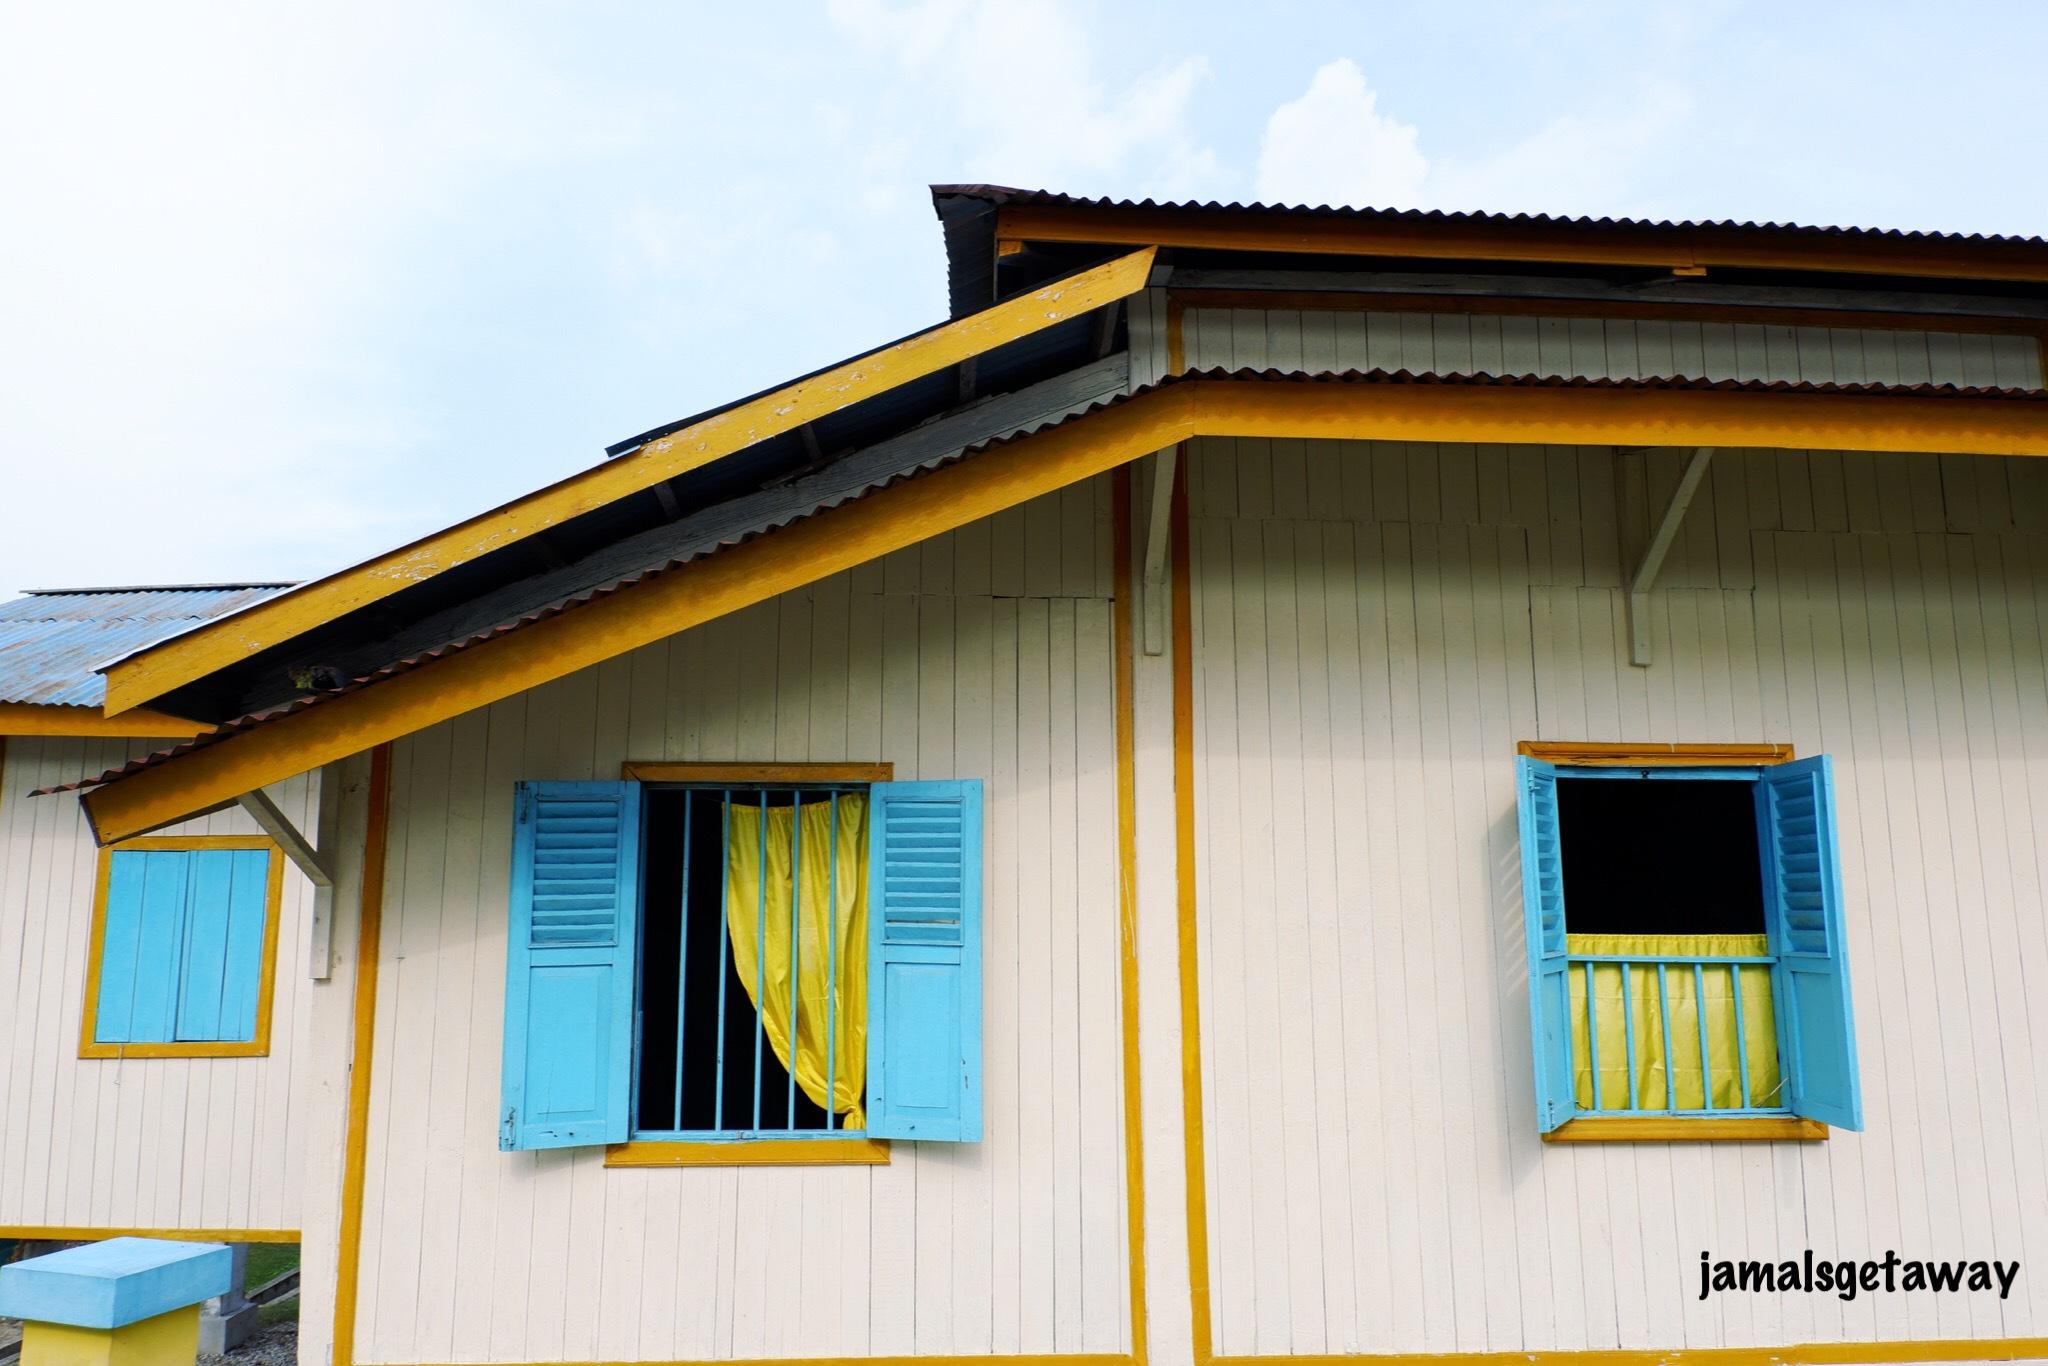 Segenggam Cerita Pekanbaru Jamalsgetaway Rumah Singgah Tuan Kadi Tepian Sungai